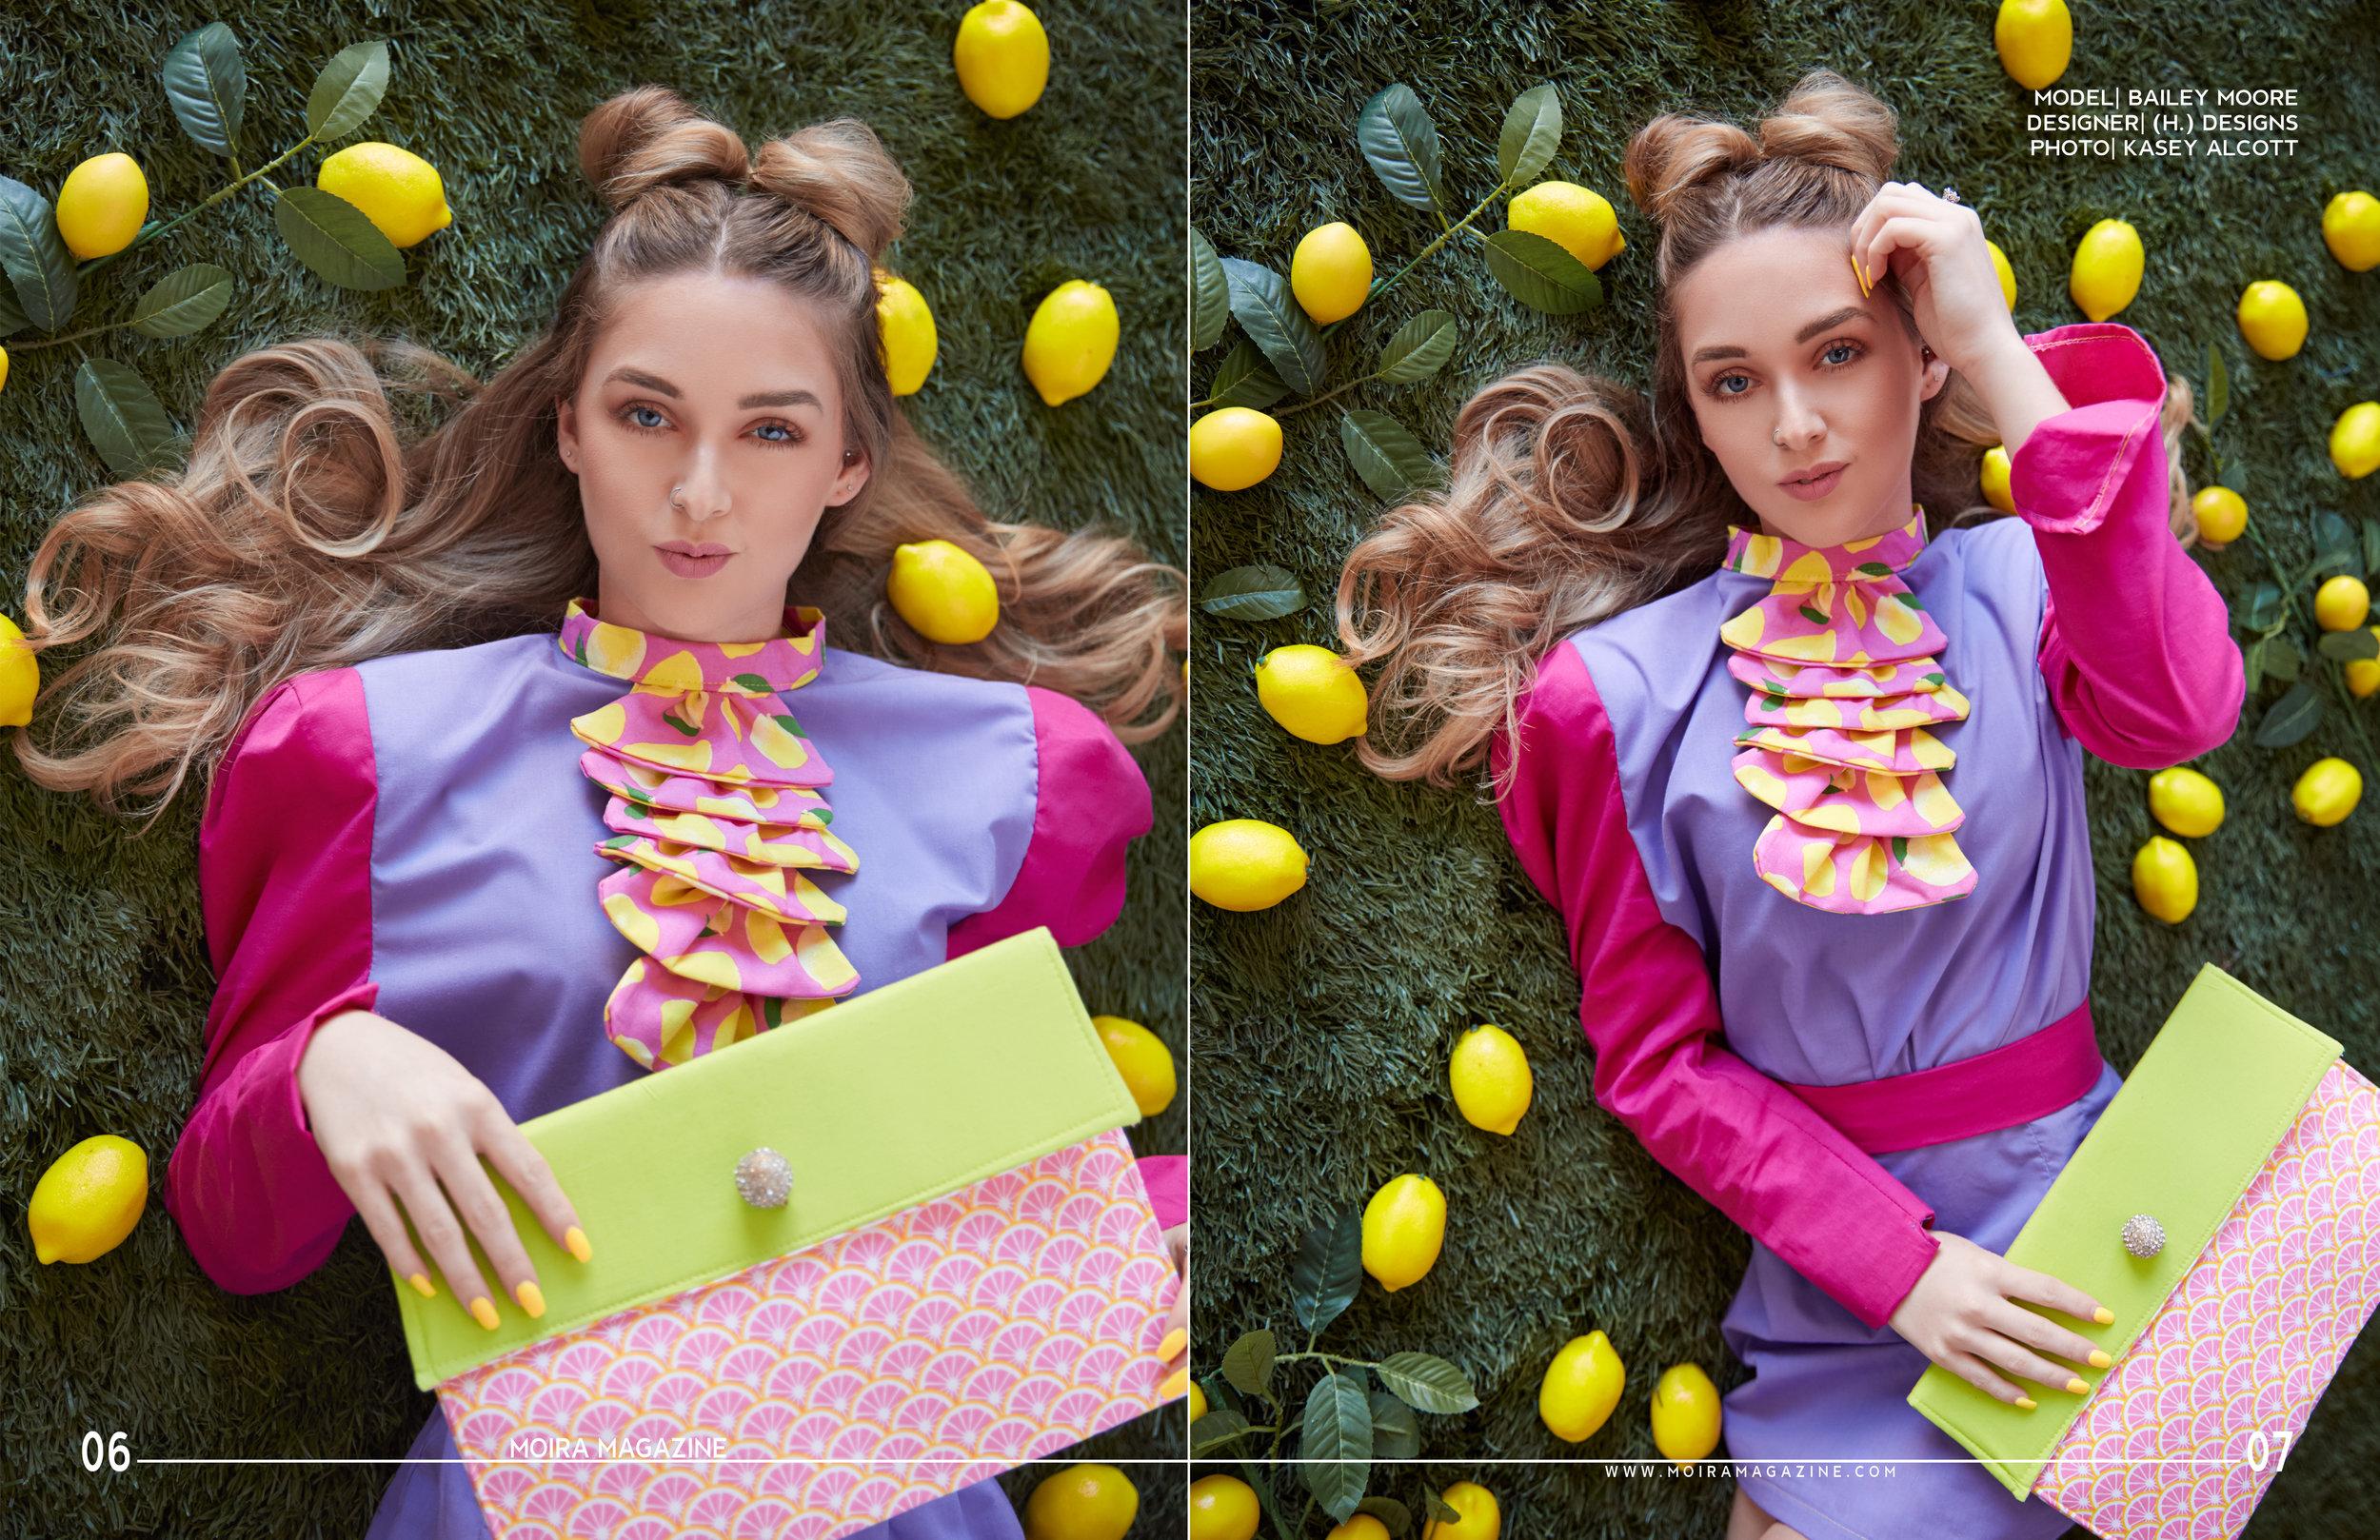 06-07 Lemon Life.jpg